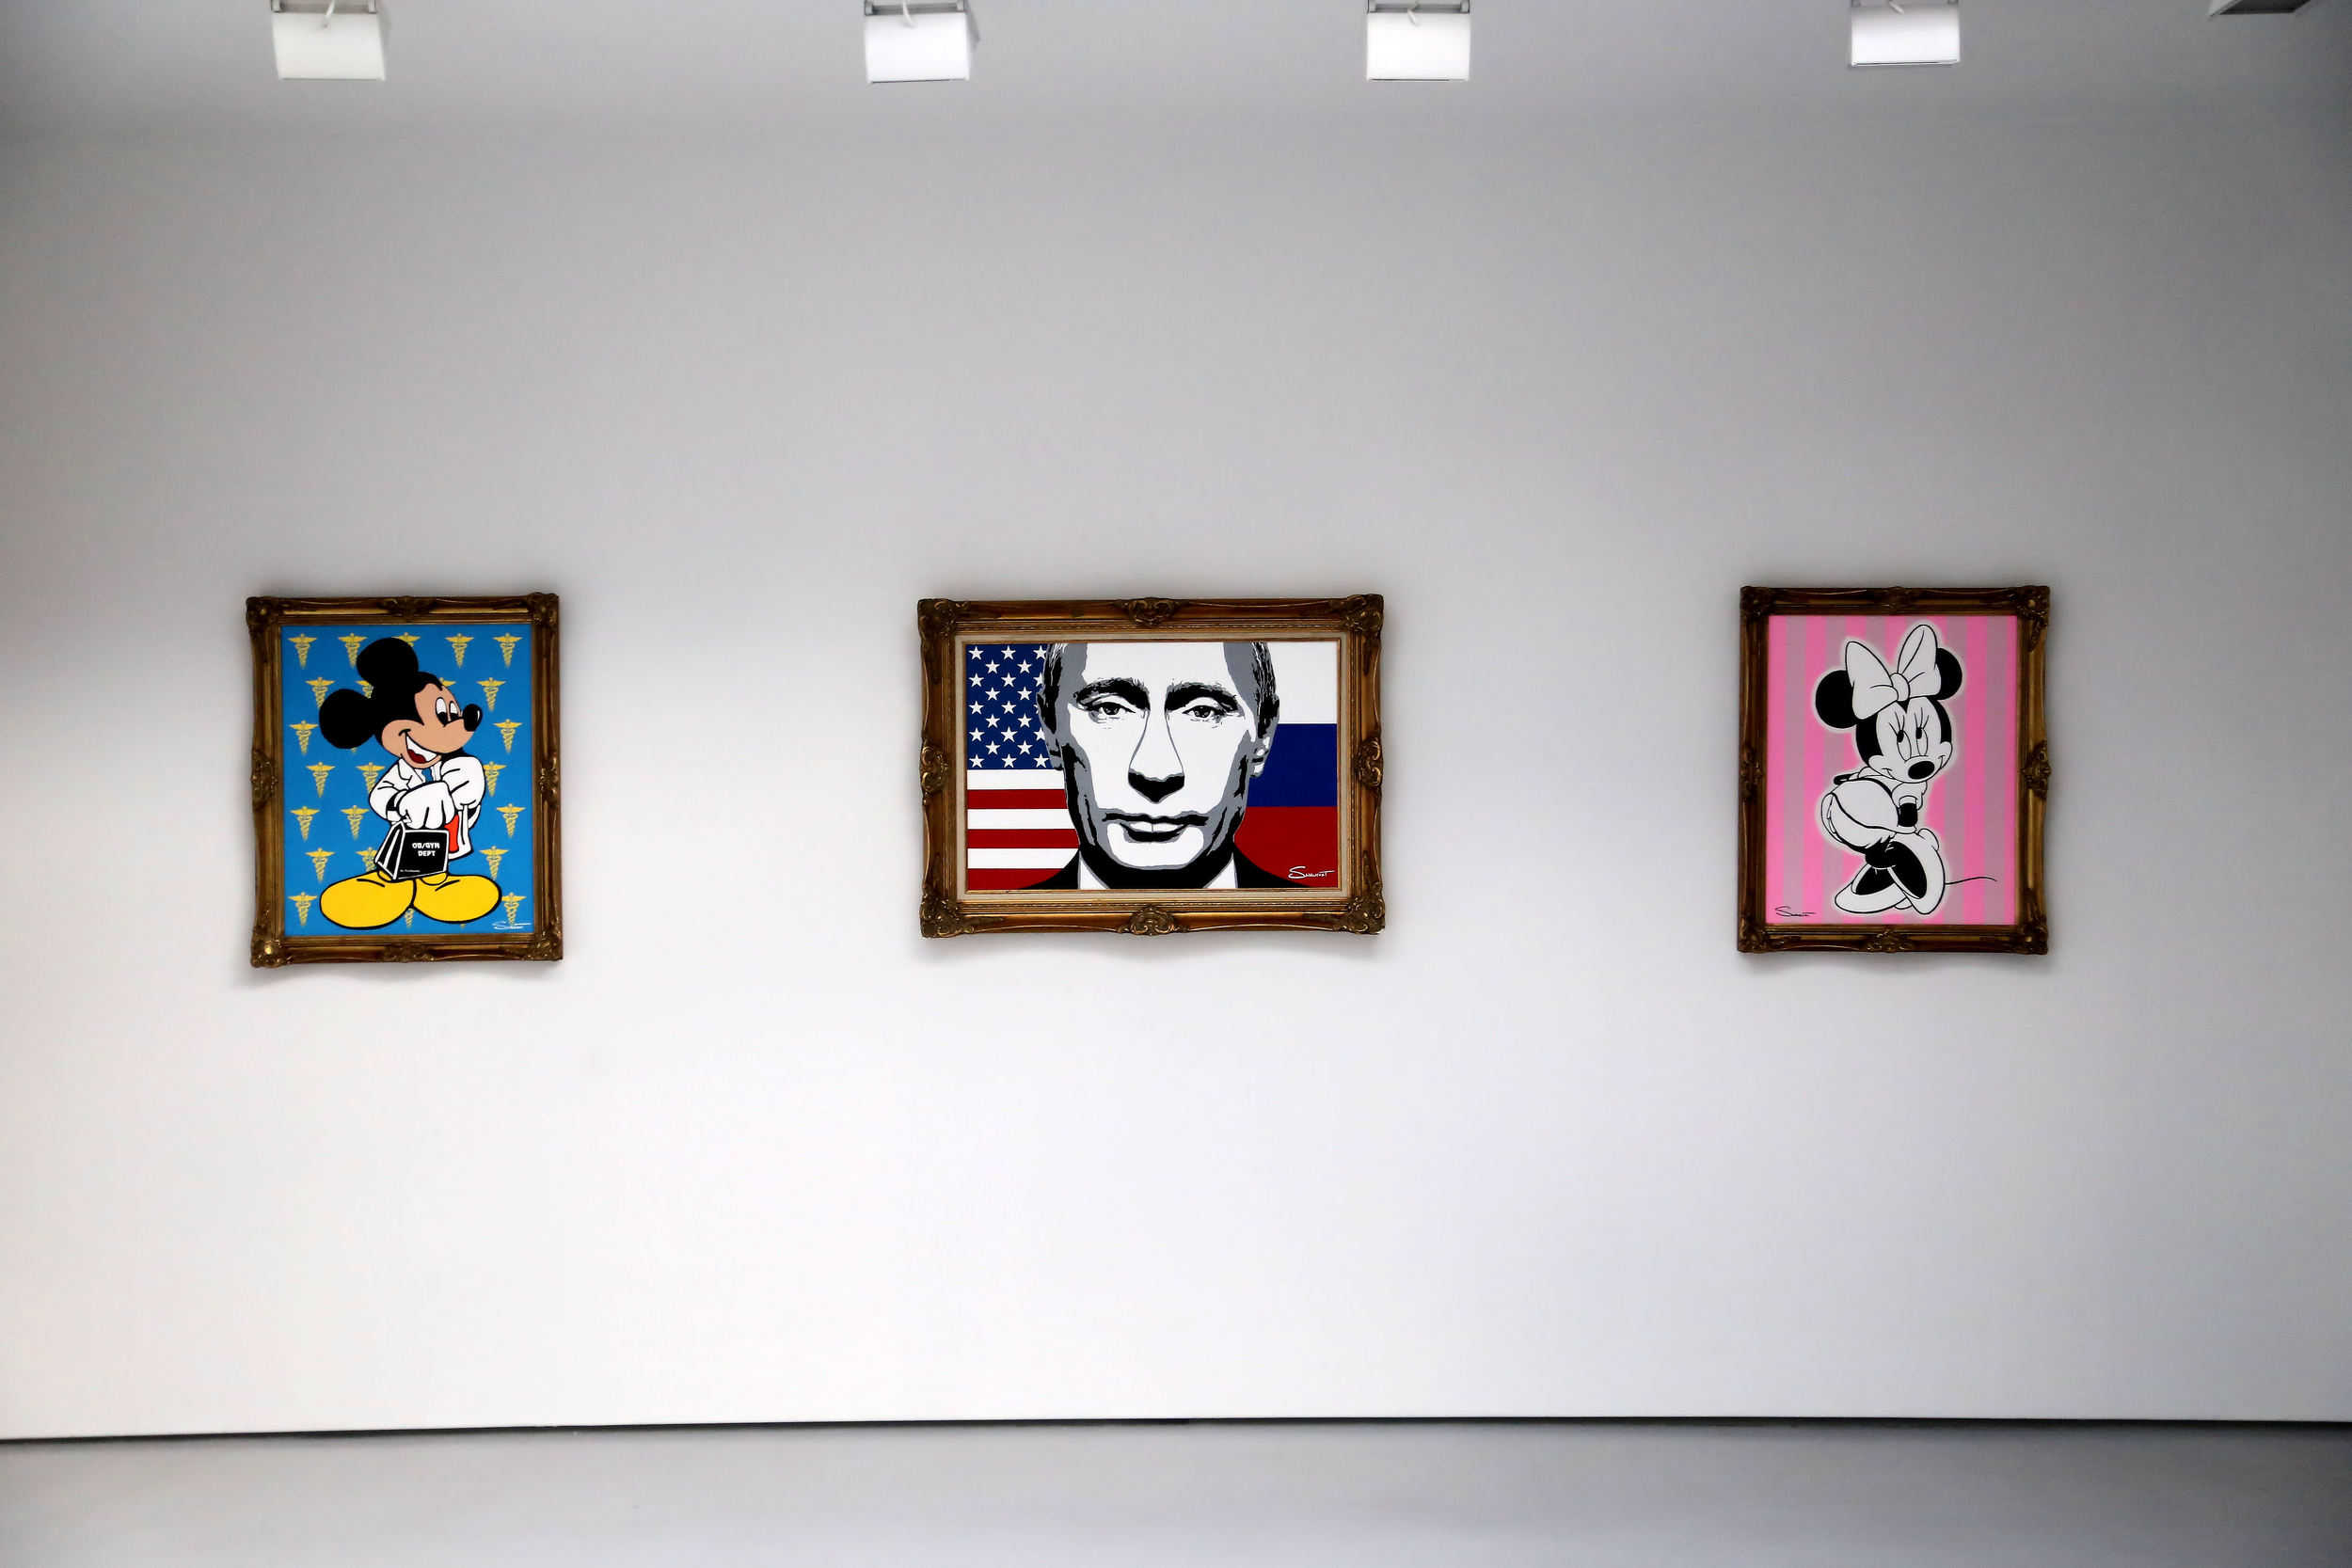 Putin Paintings with overhead lights.jpg